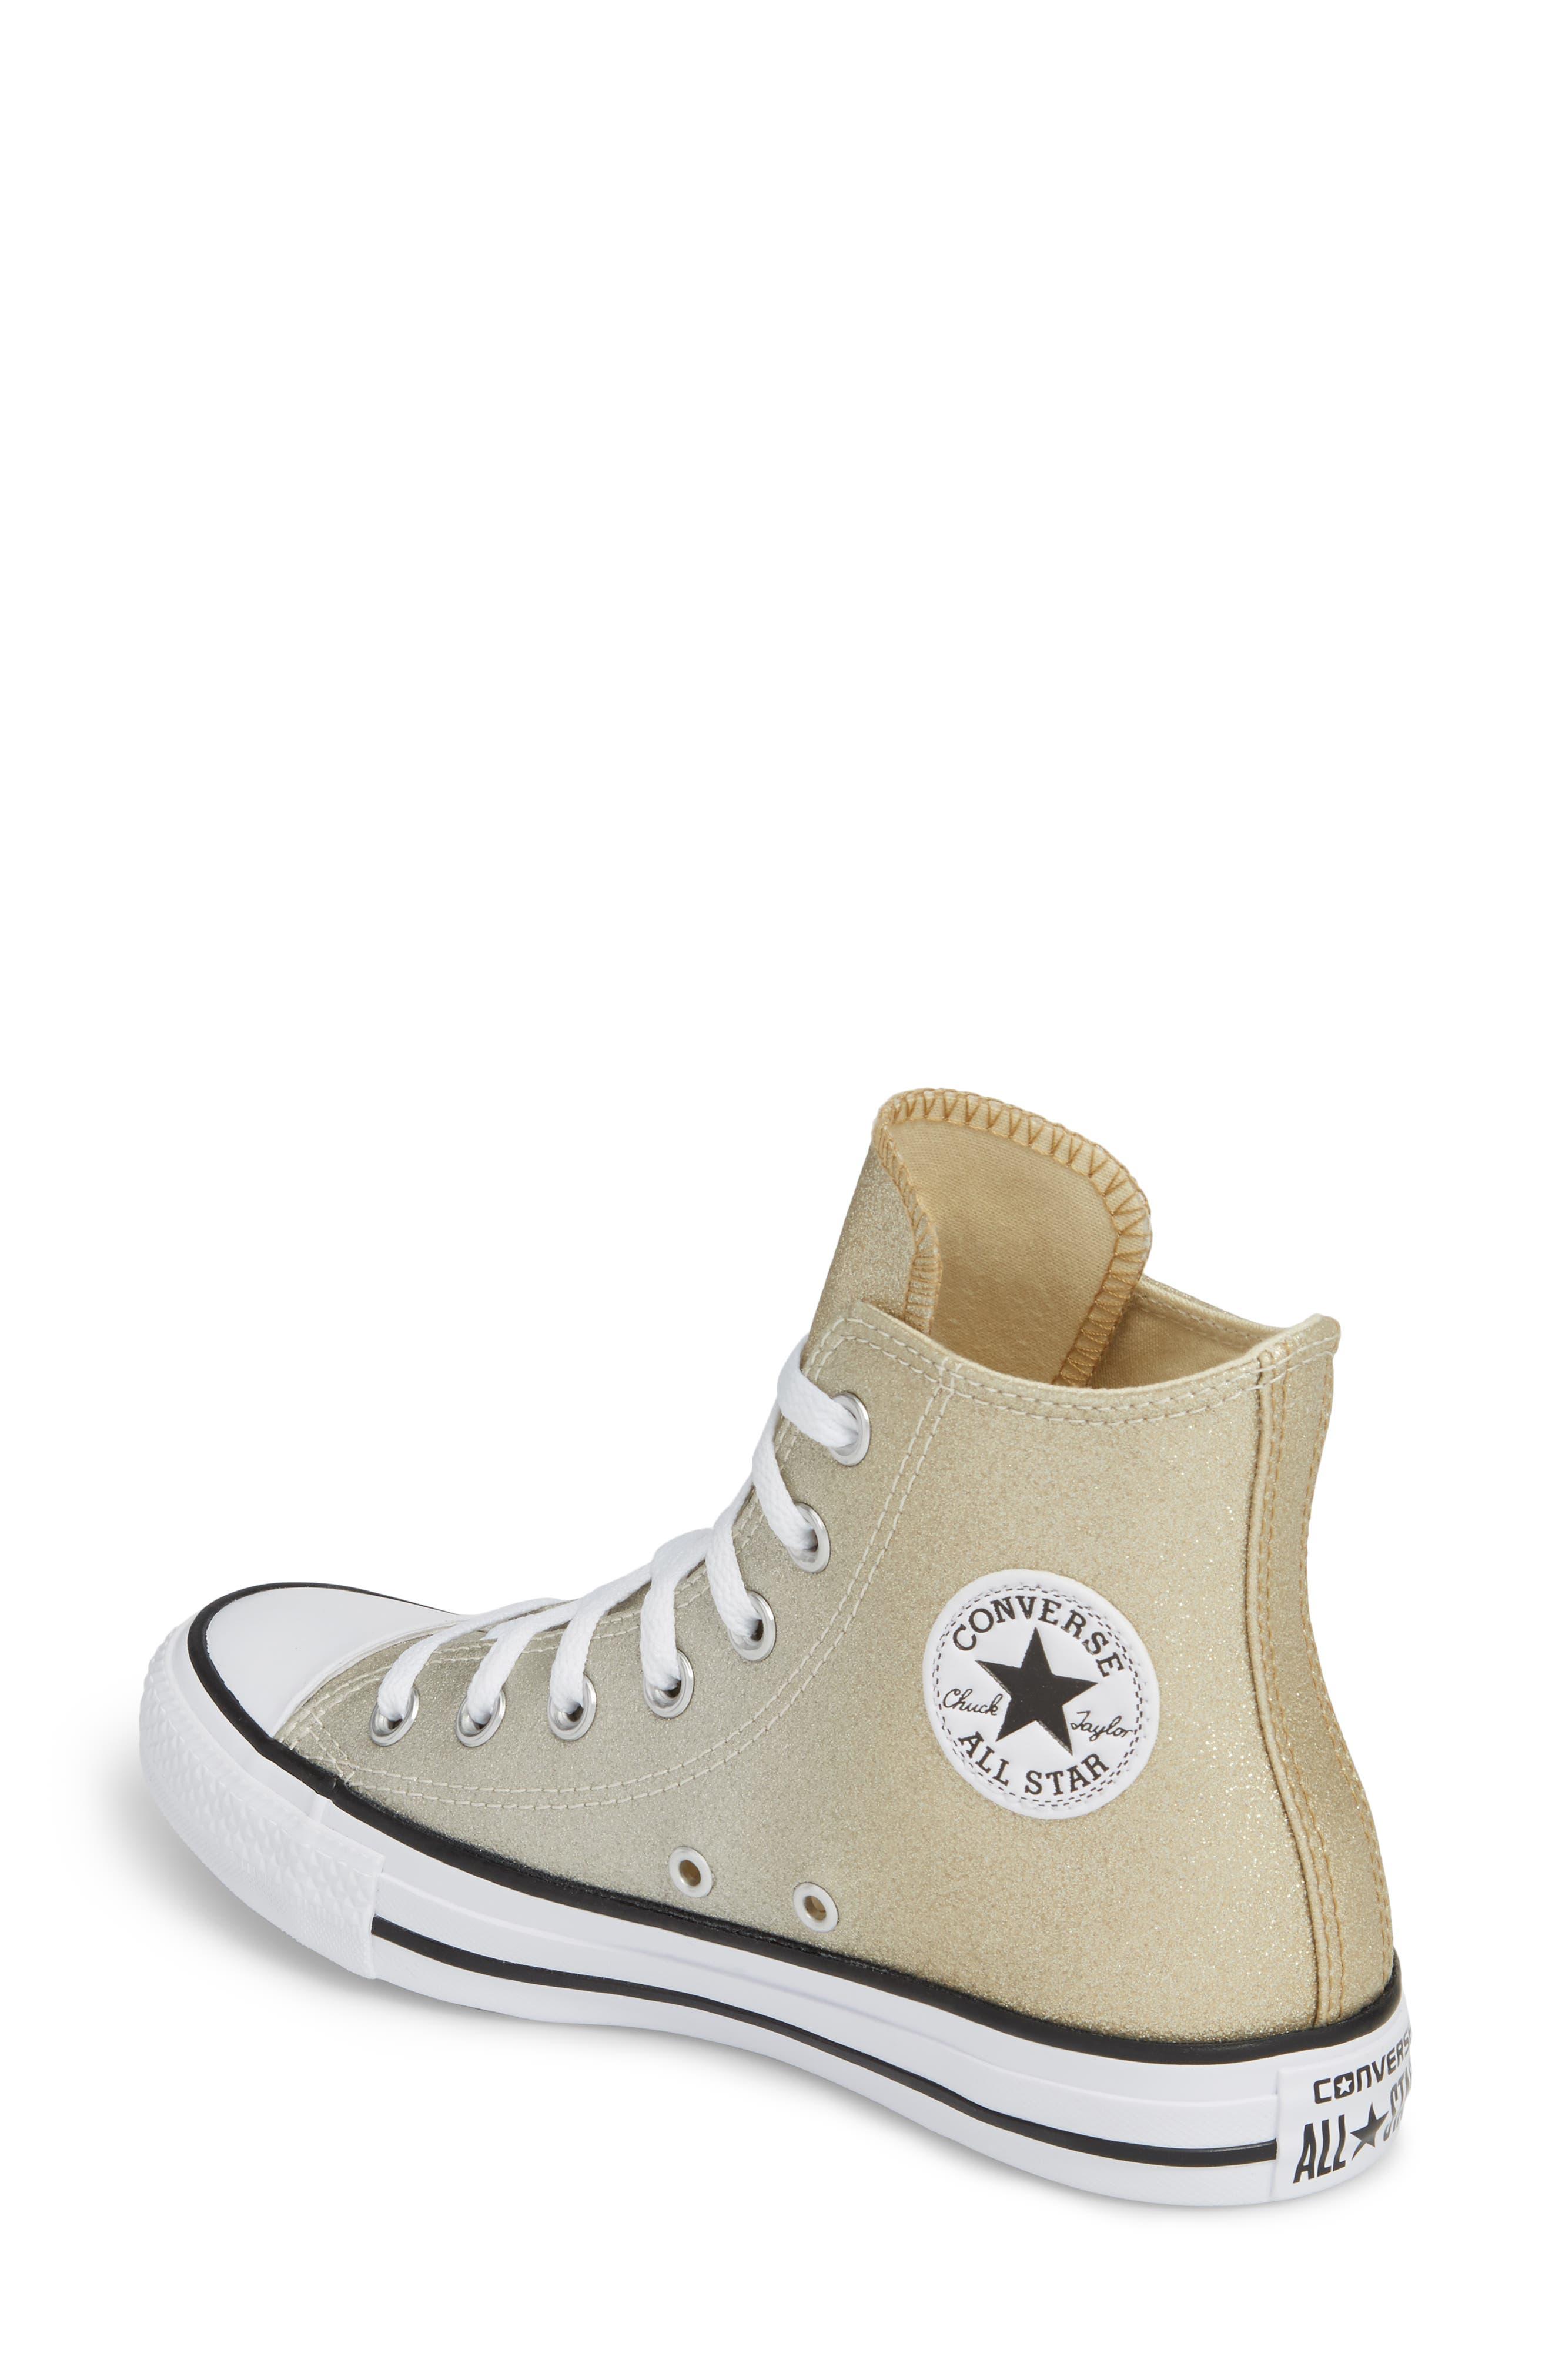 CONVERSE,                             Chuck Taylor<sup>®</sup> All Star<sup>®</sup> Ombré Metallic High Top Sneaker,                             Alternate thumbnail 2, color,                             710